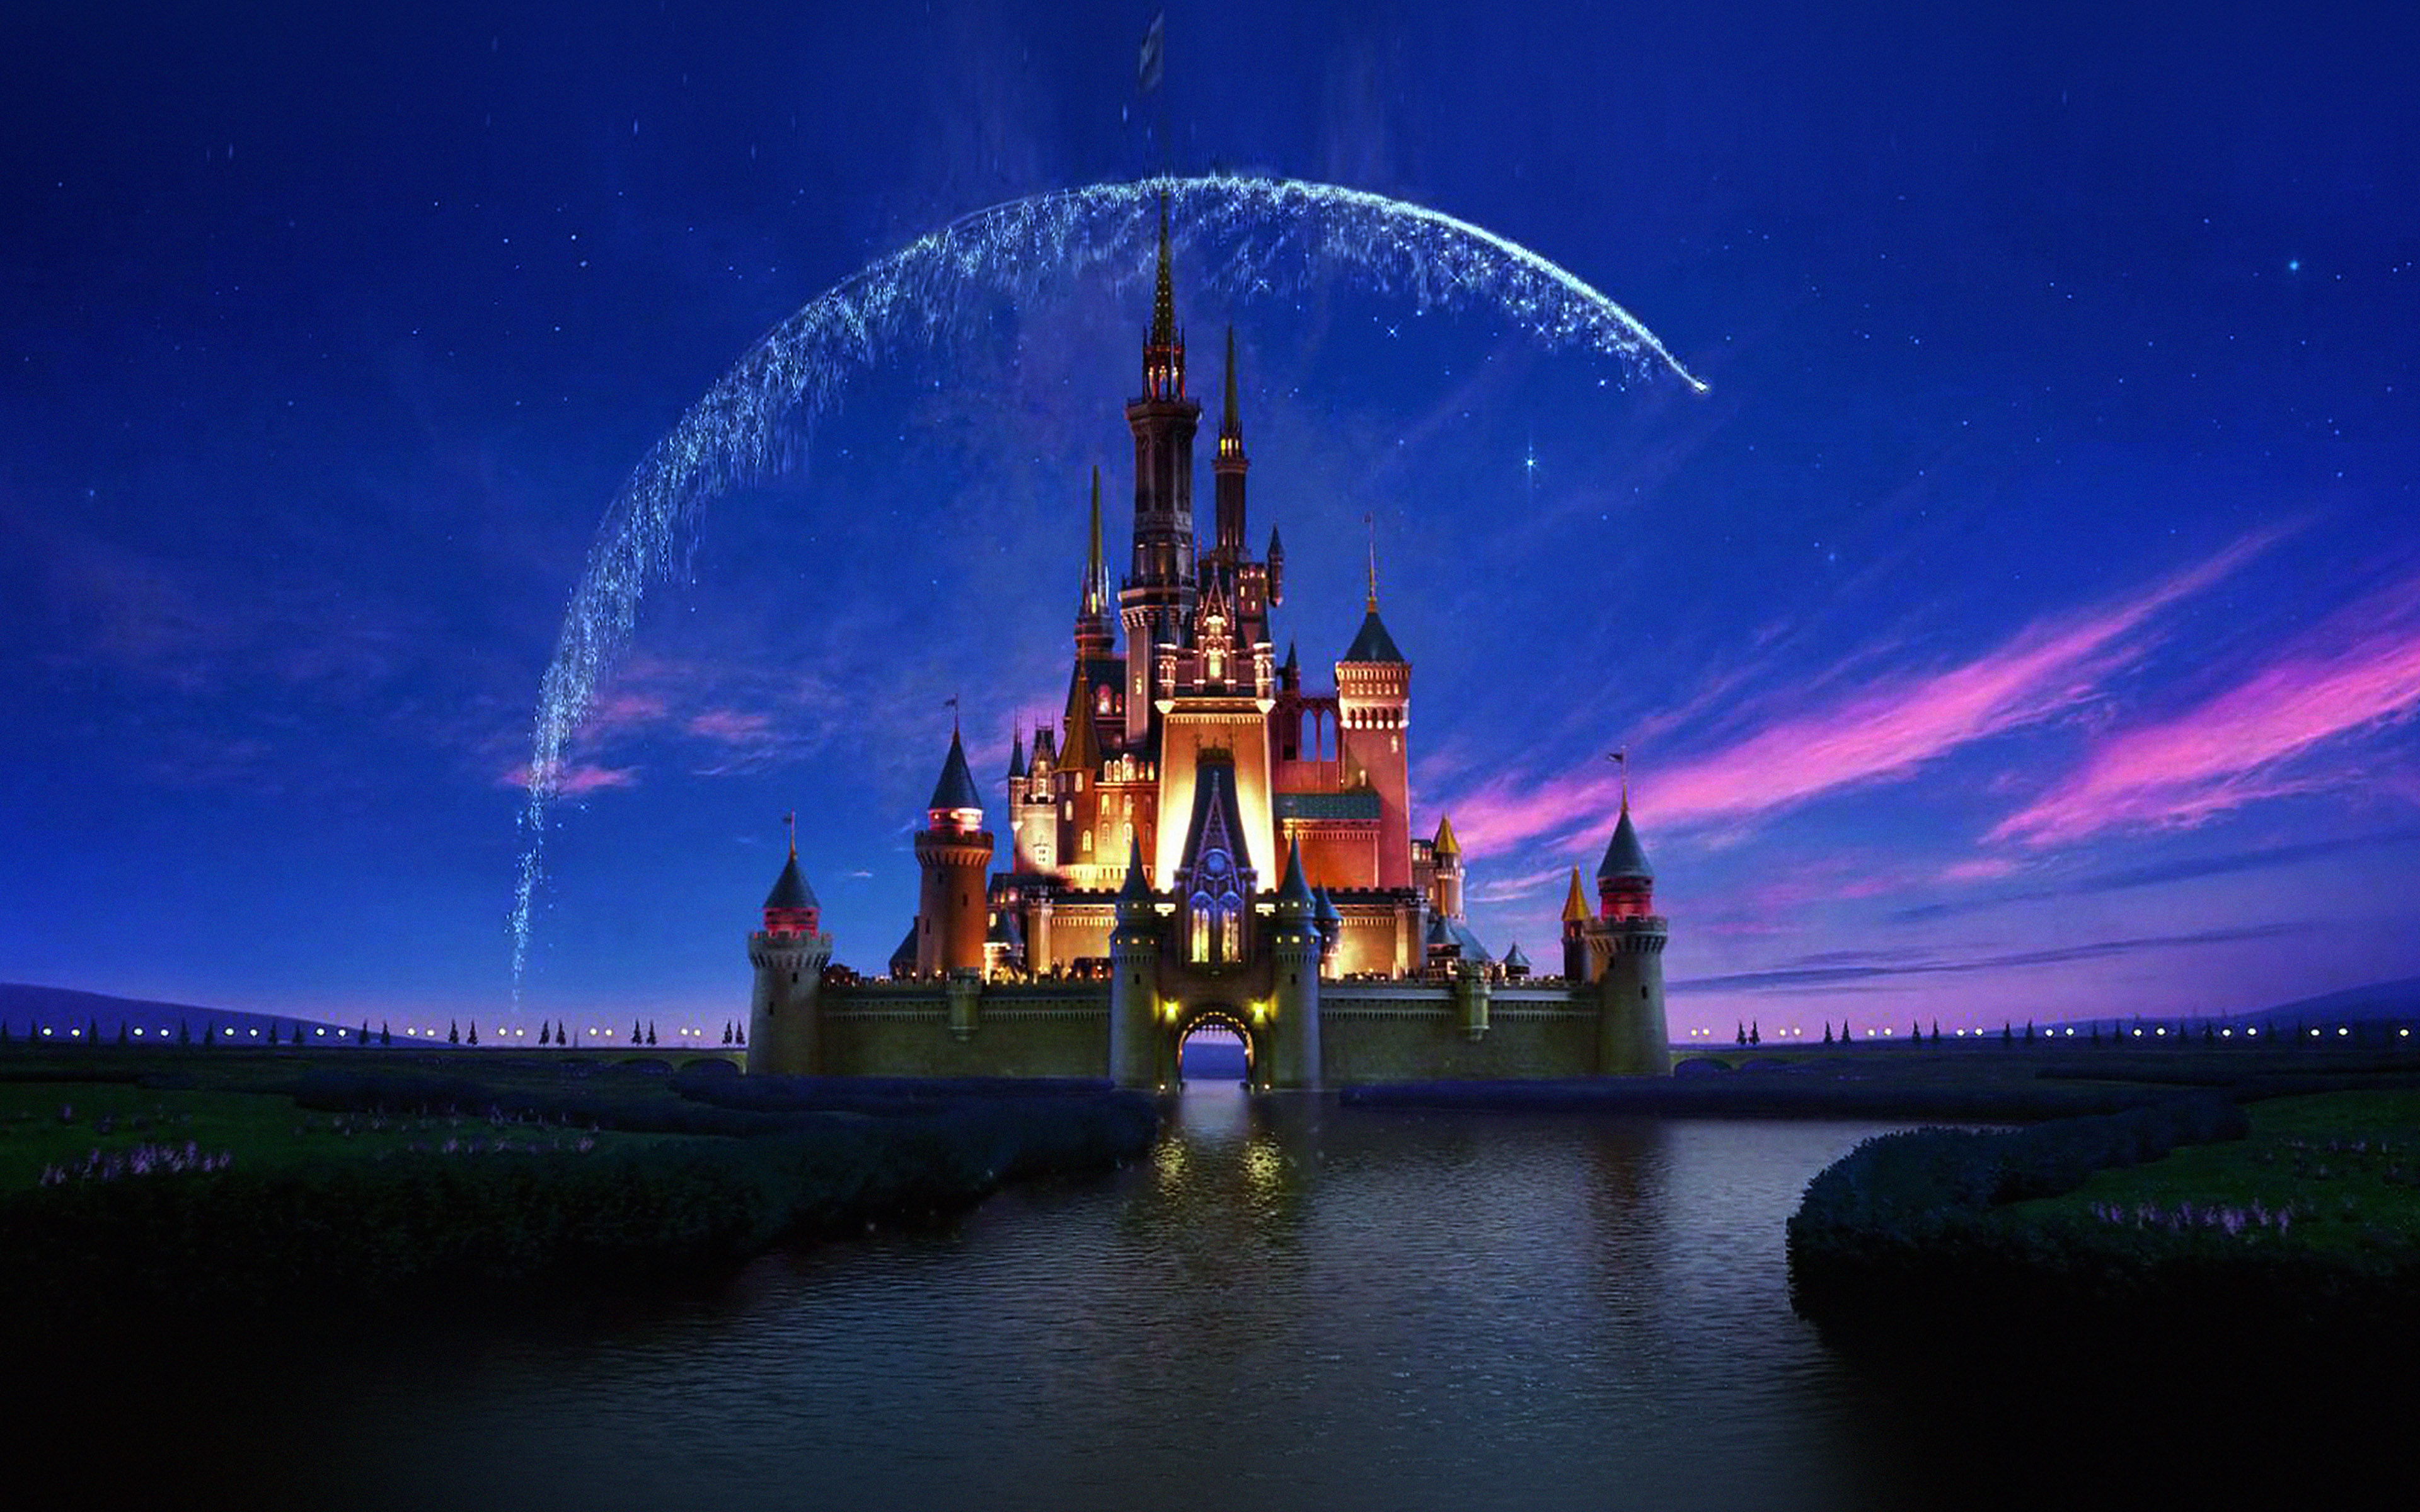 Ac76 Wallpaper Disney Castle Artwork Illust Sky Papers Co